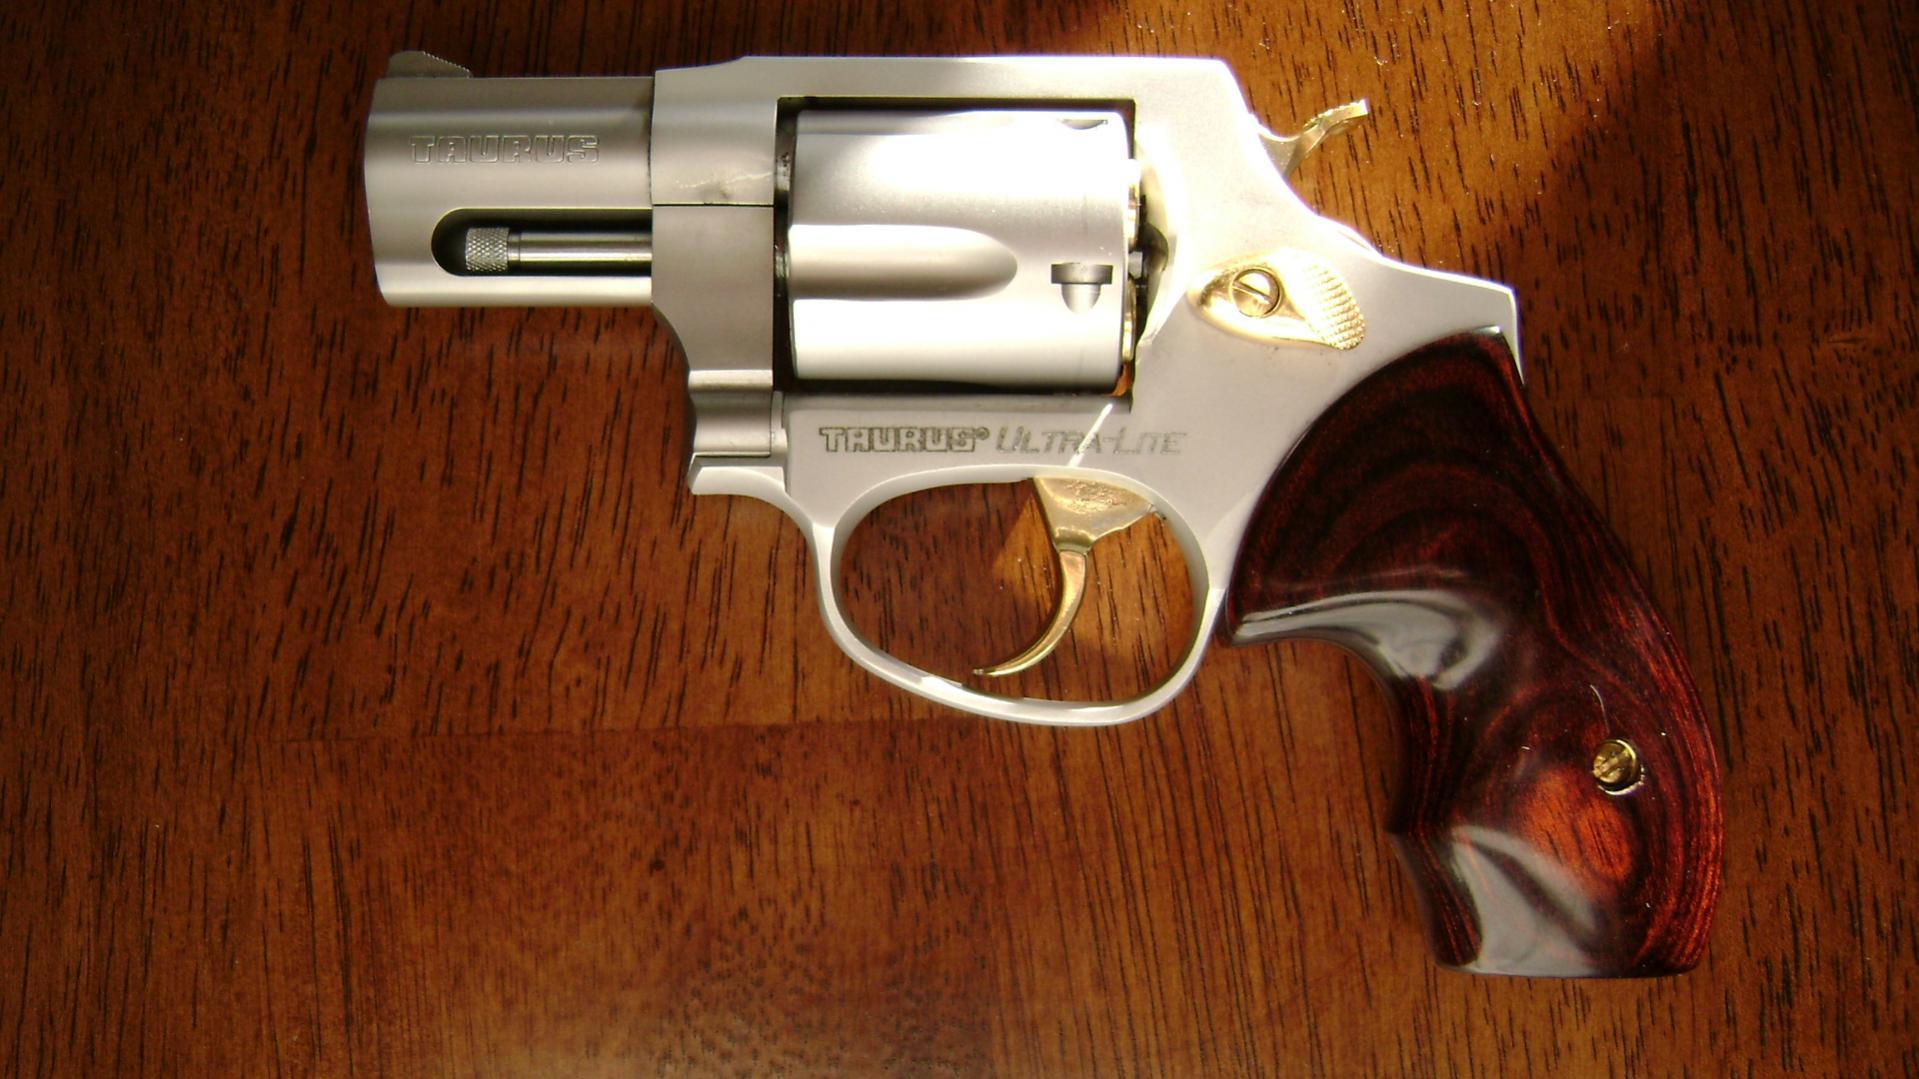 My wife's new carry gun!-dsc00783.jpg